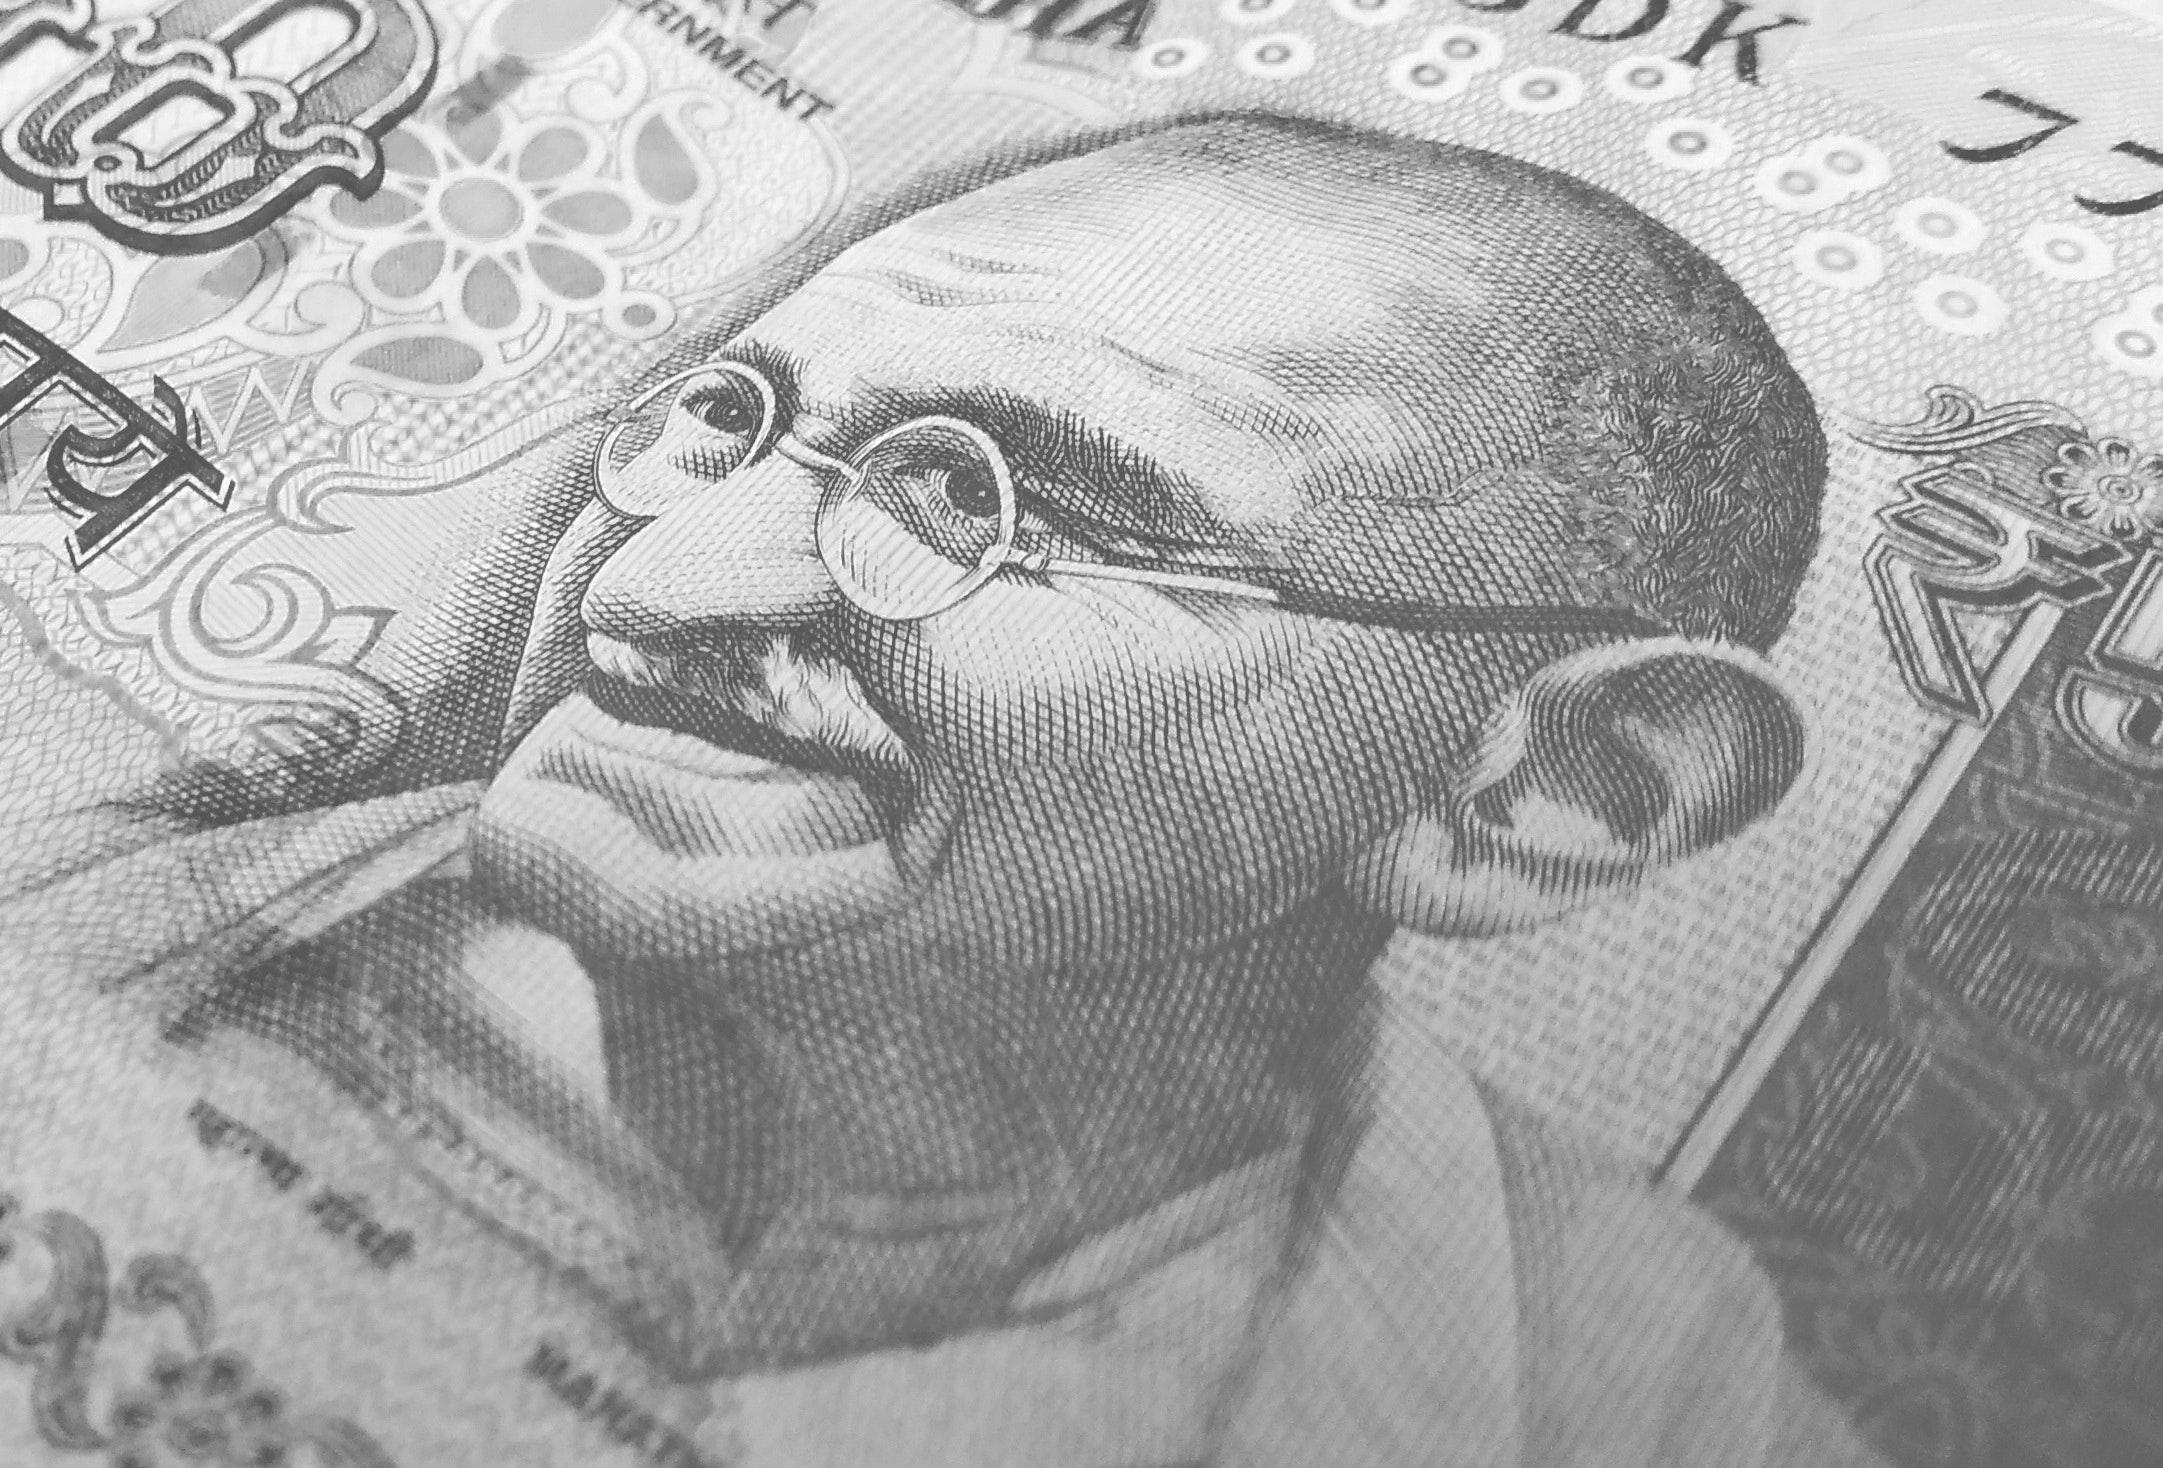 indian-rupee-164636